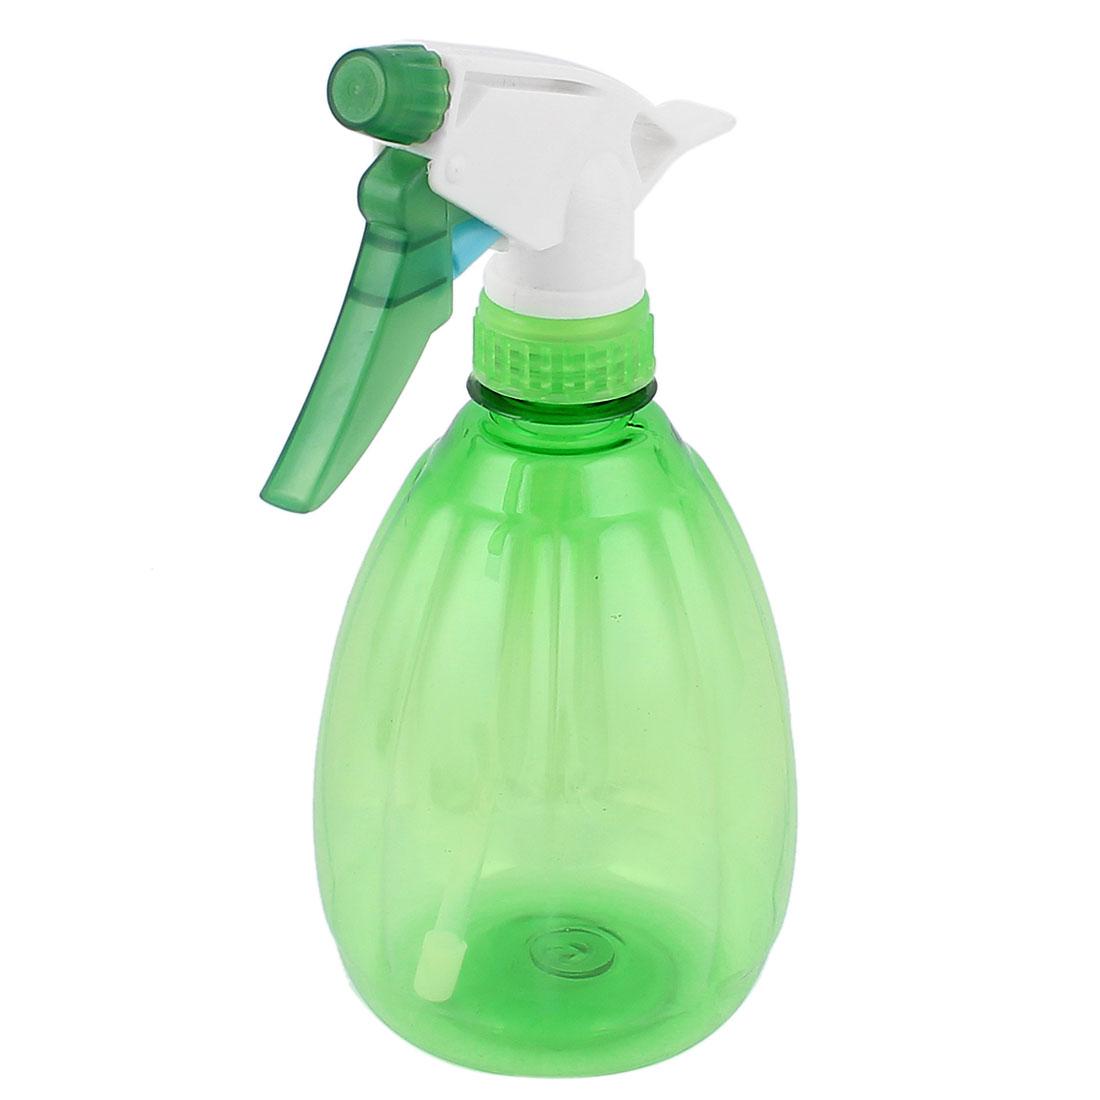 Plastic Nozzle Head Water Sprayer Trigger Spray Bottle Green 500ml